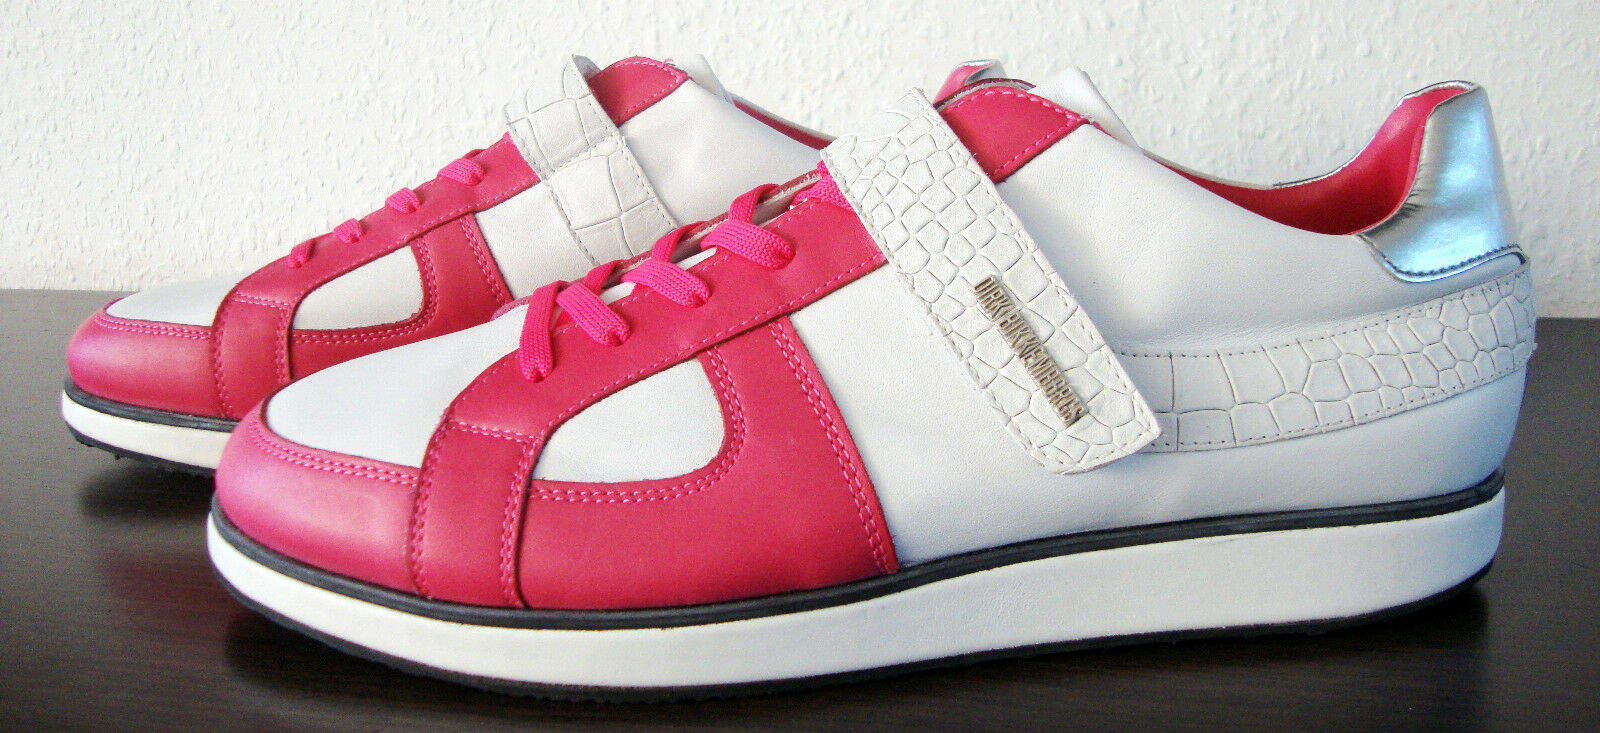 DIRK BIKKEMBERGS Sneakers FILLER DBR 836 Schuhes Herren Schuhe Leder Gr.42 NEU